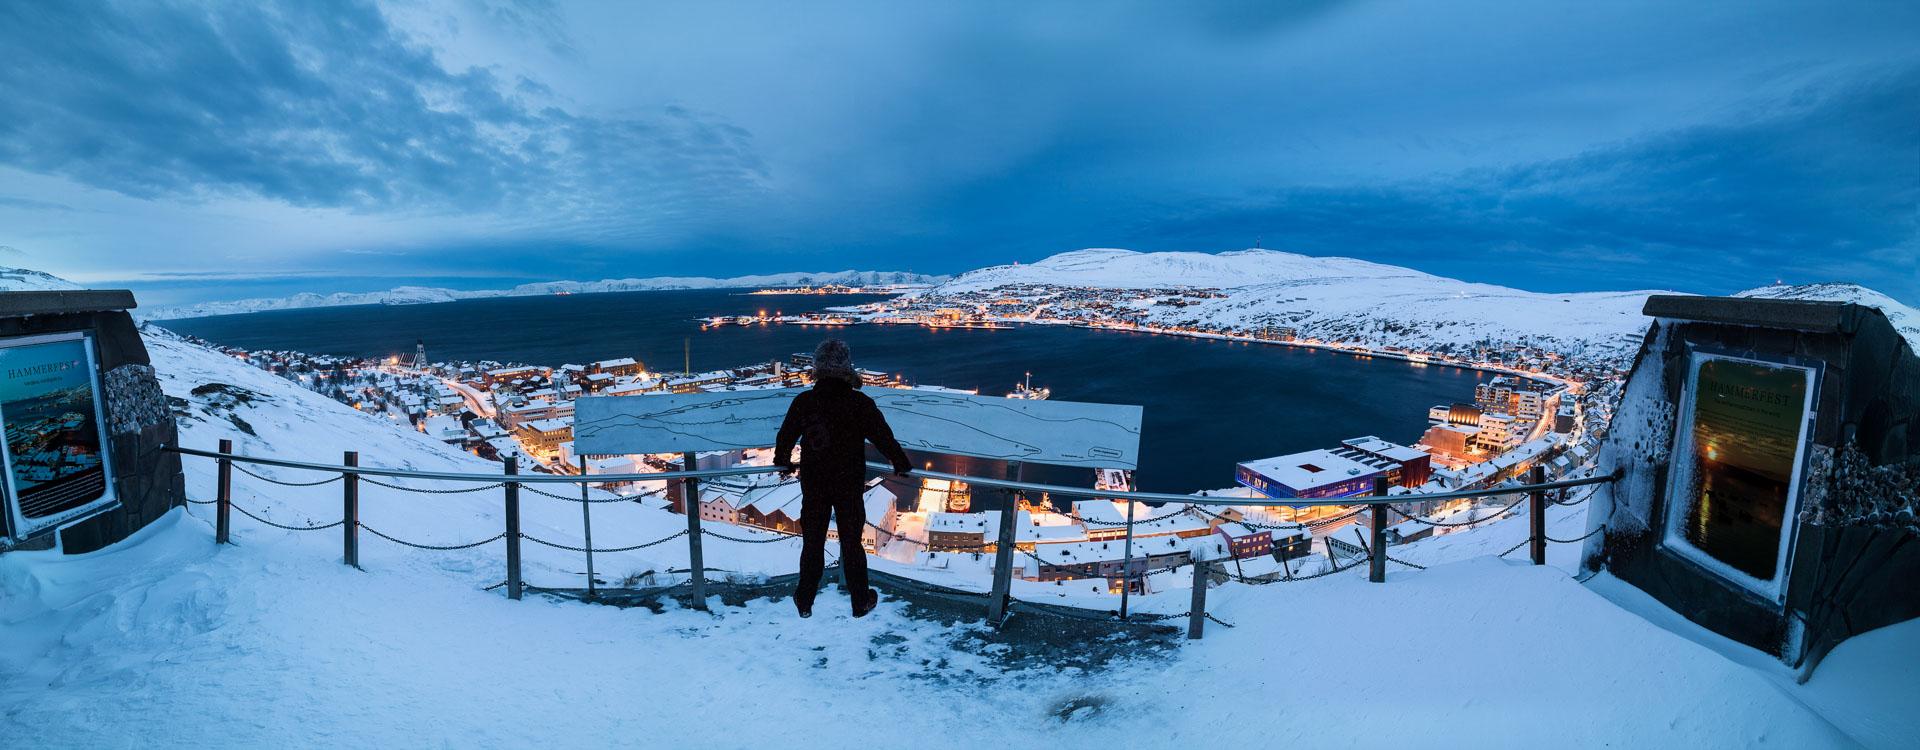 Fra byfjellet Salen i vinterskumringa (c) Ziggi Wantuch/Hammerfest Turist